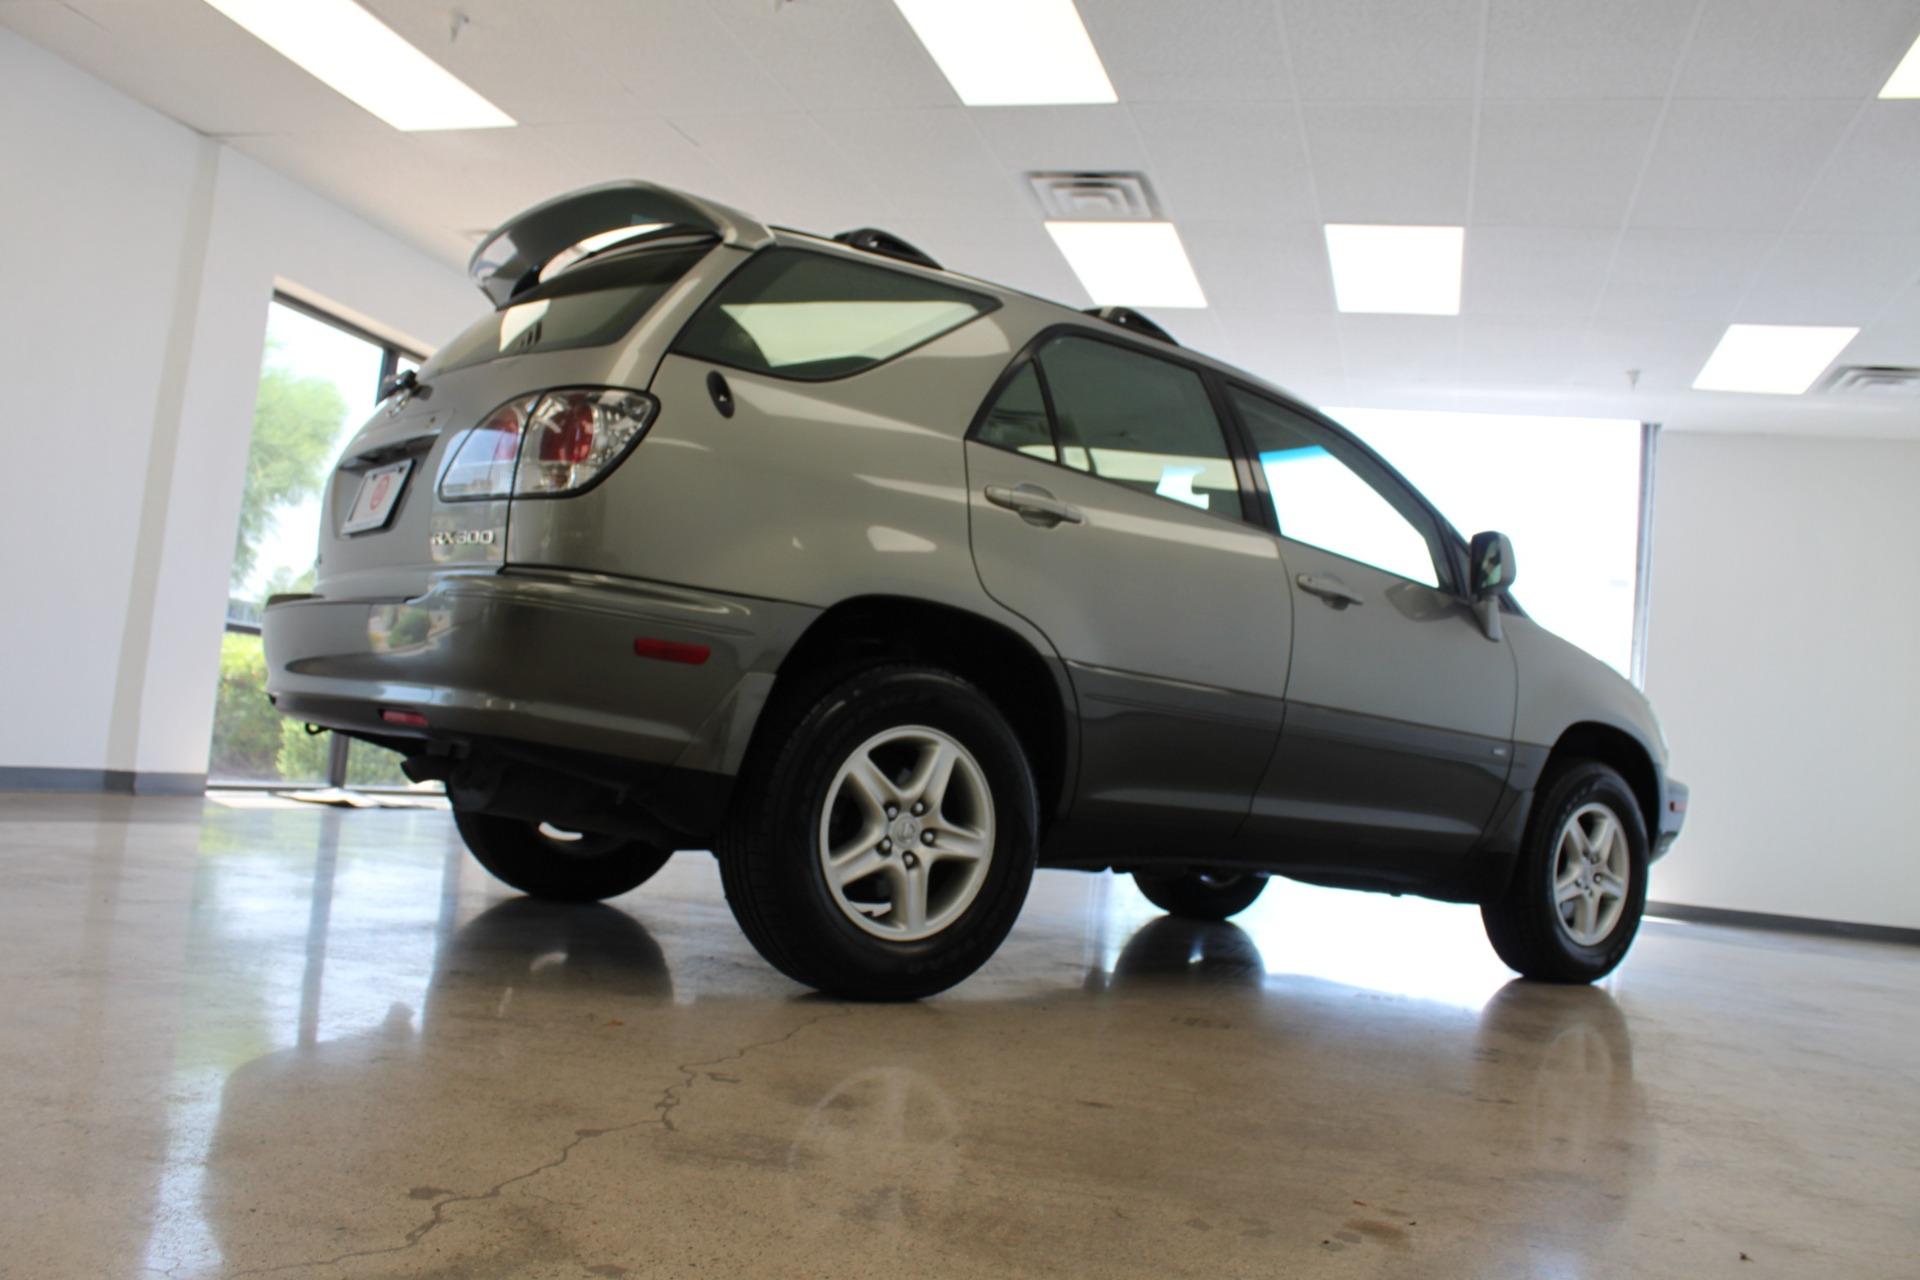 Used-2002-Lexus-RX-300-Dodge